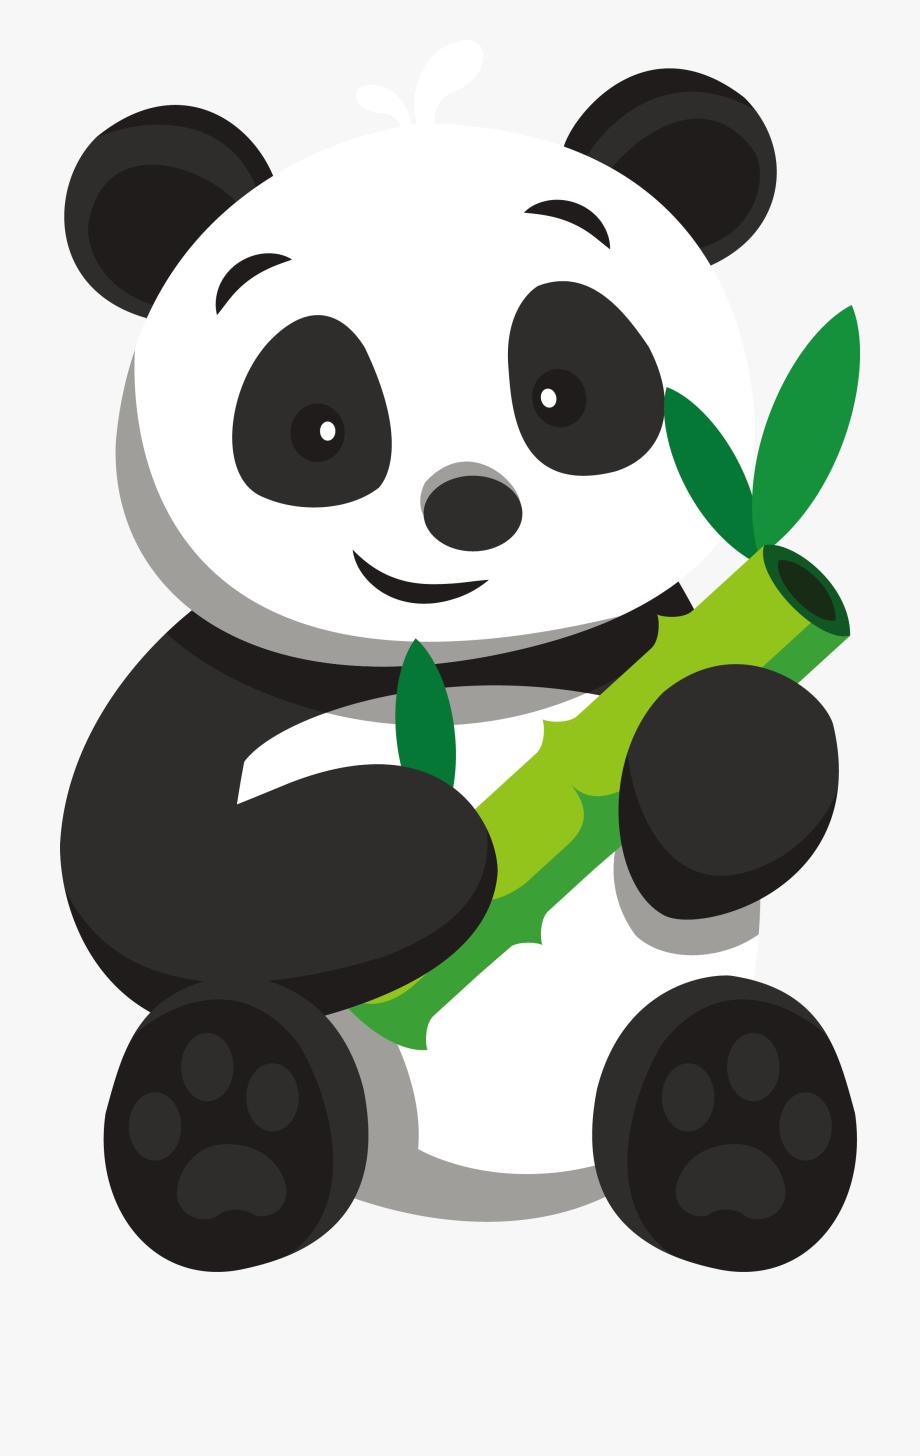 Bamboo clipart panda. Clip royalty free stock